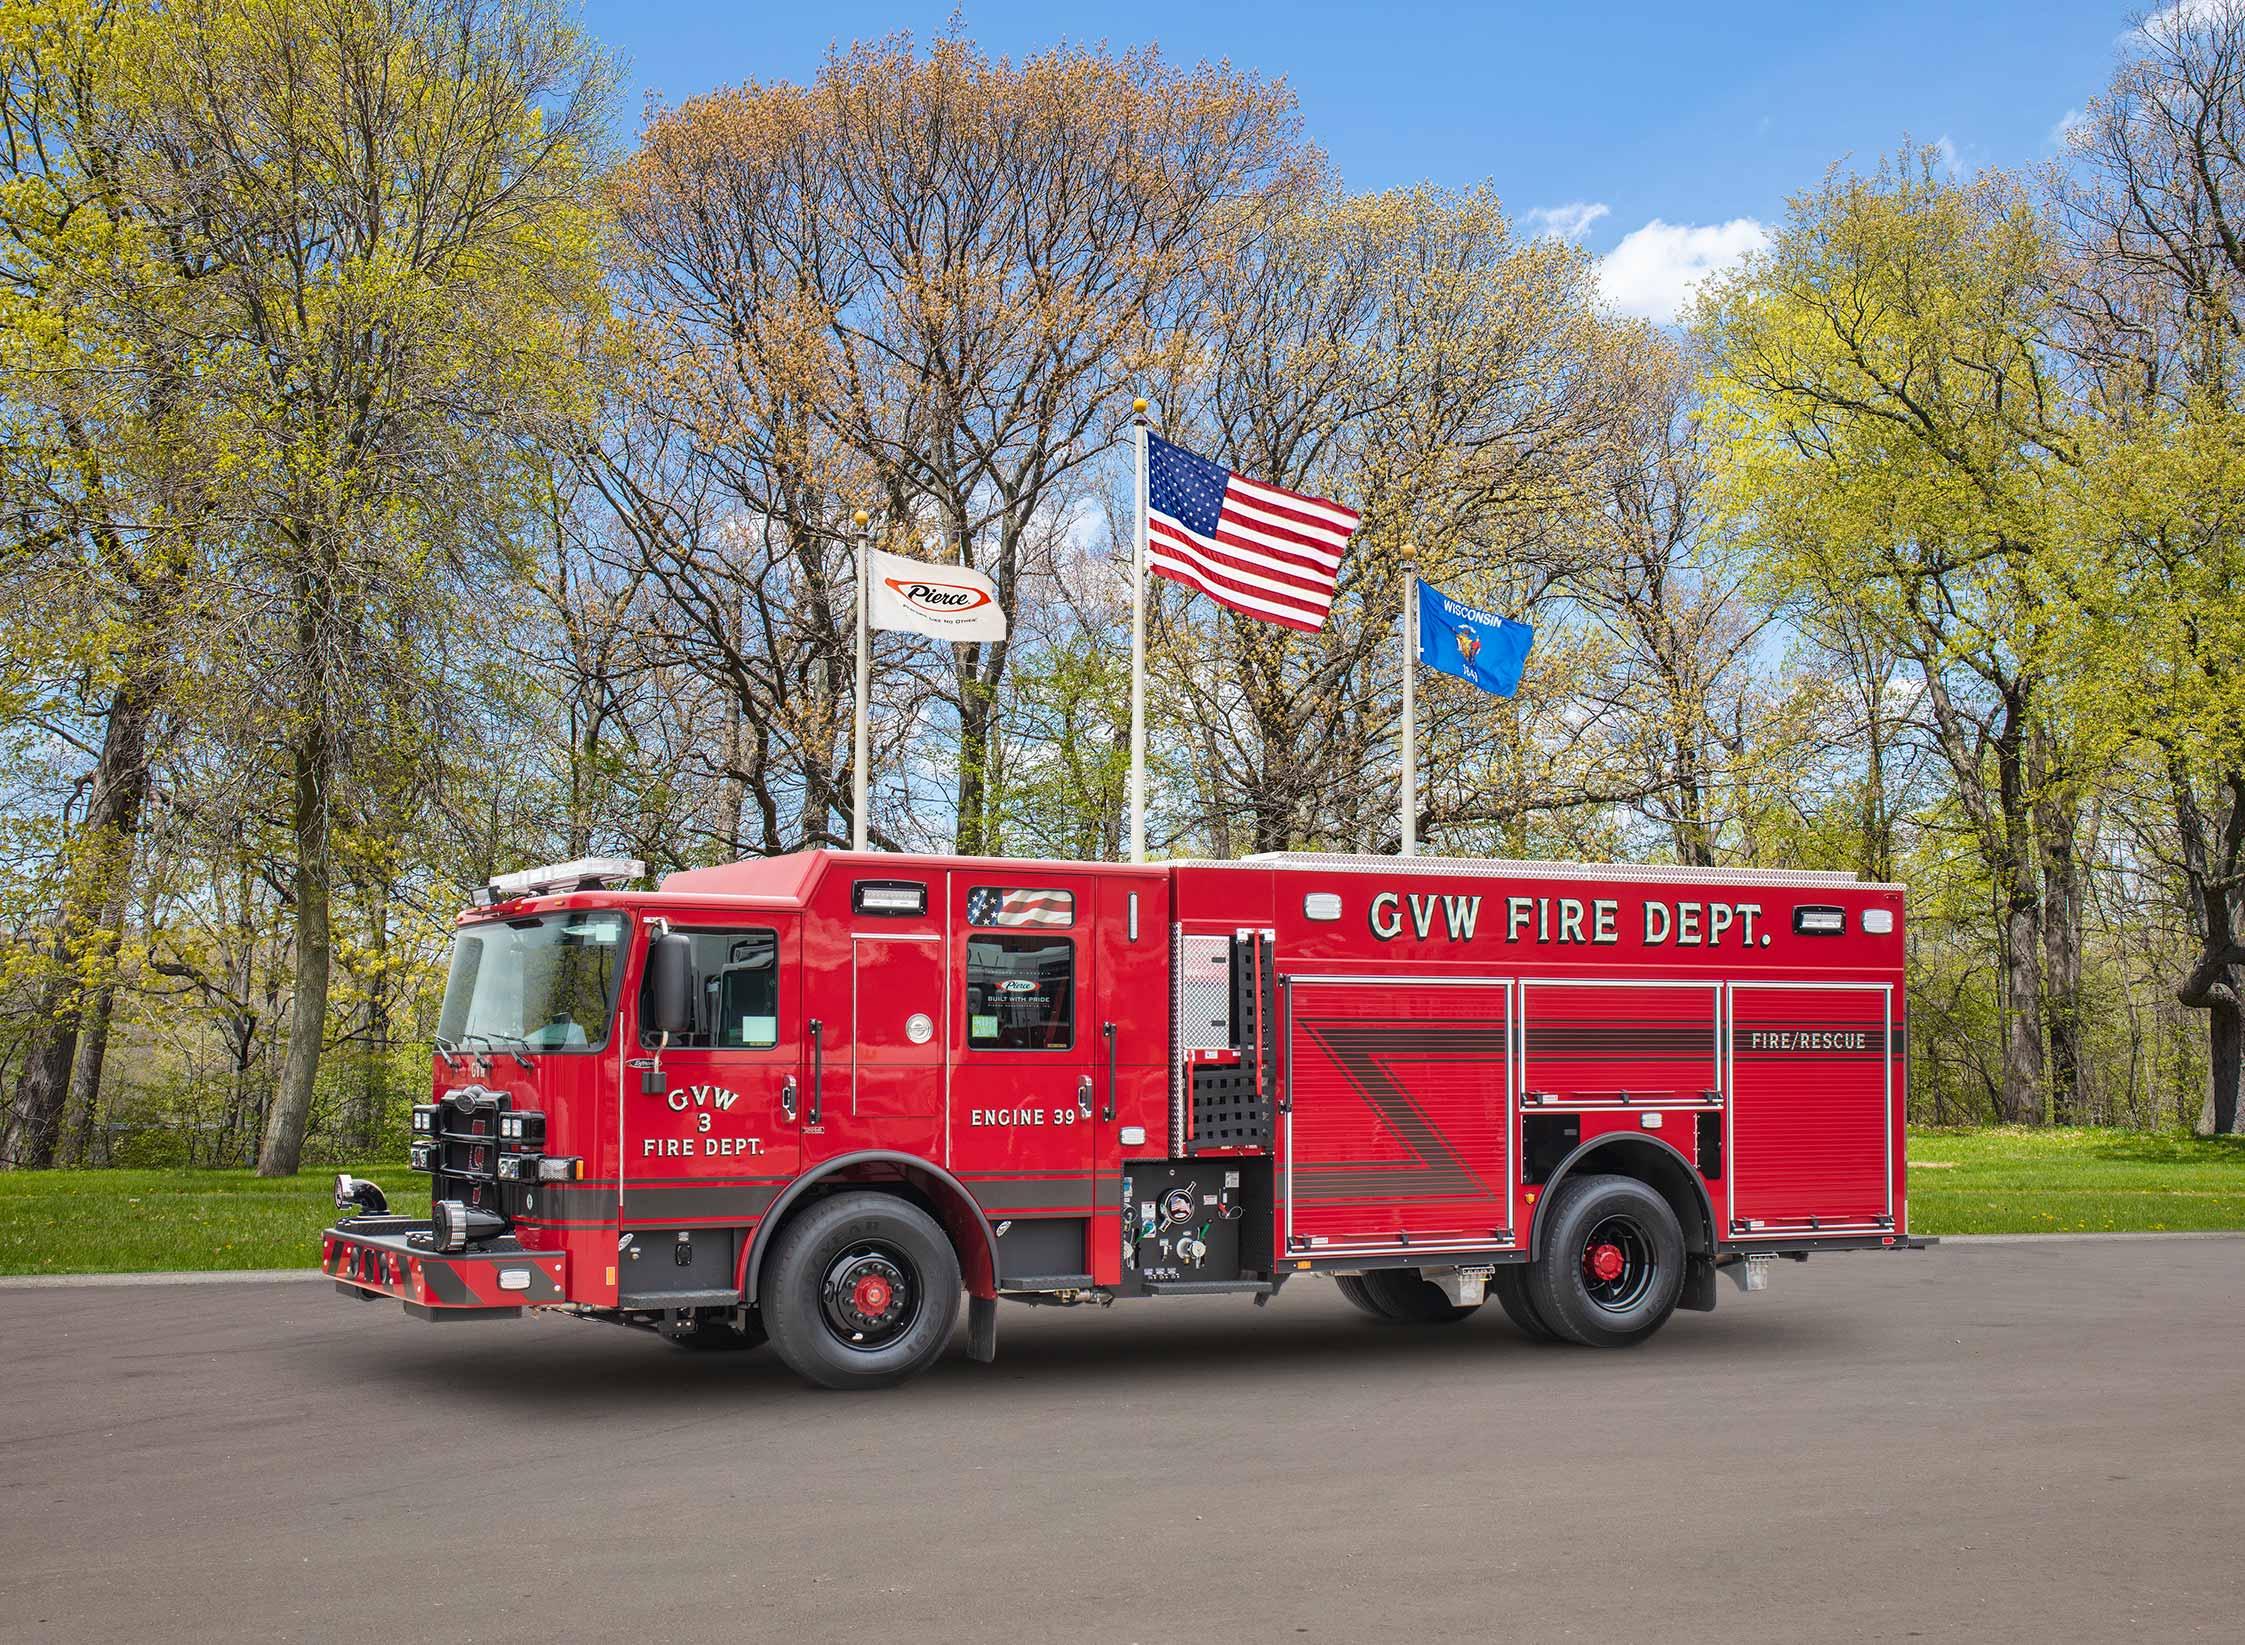 G.V.W. Fire Department - Pumper